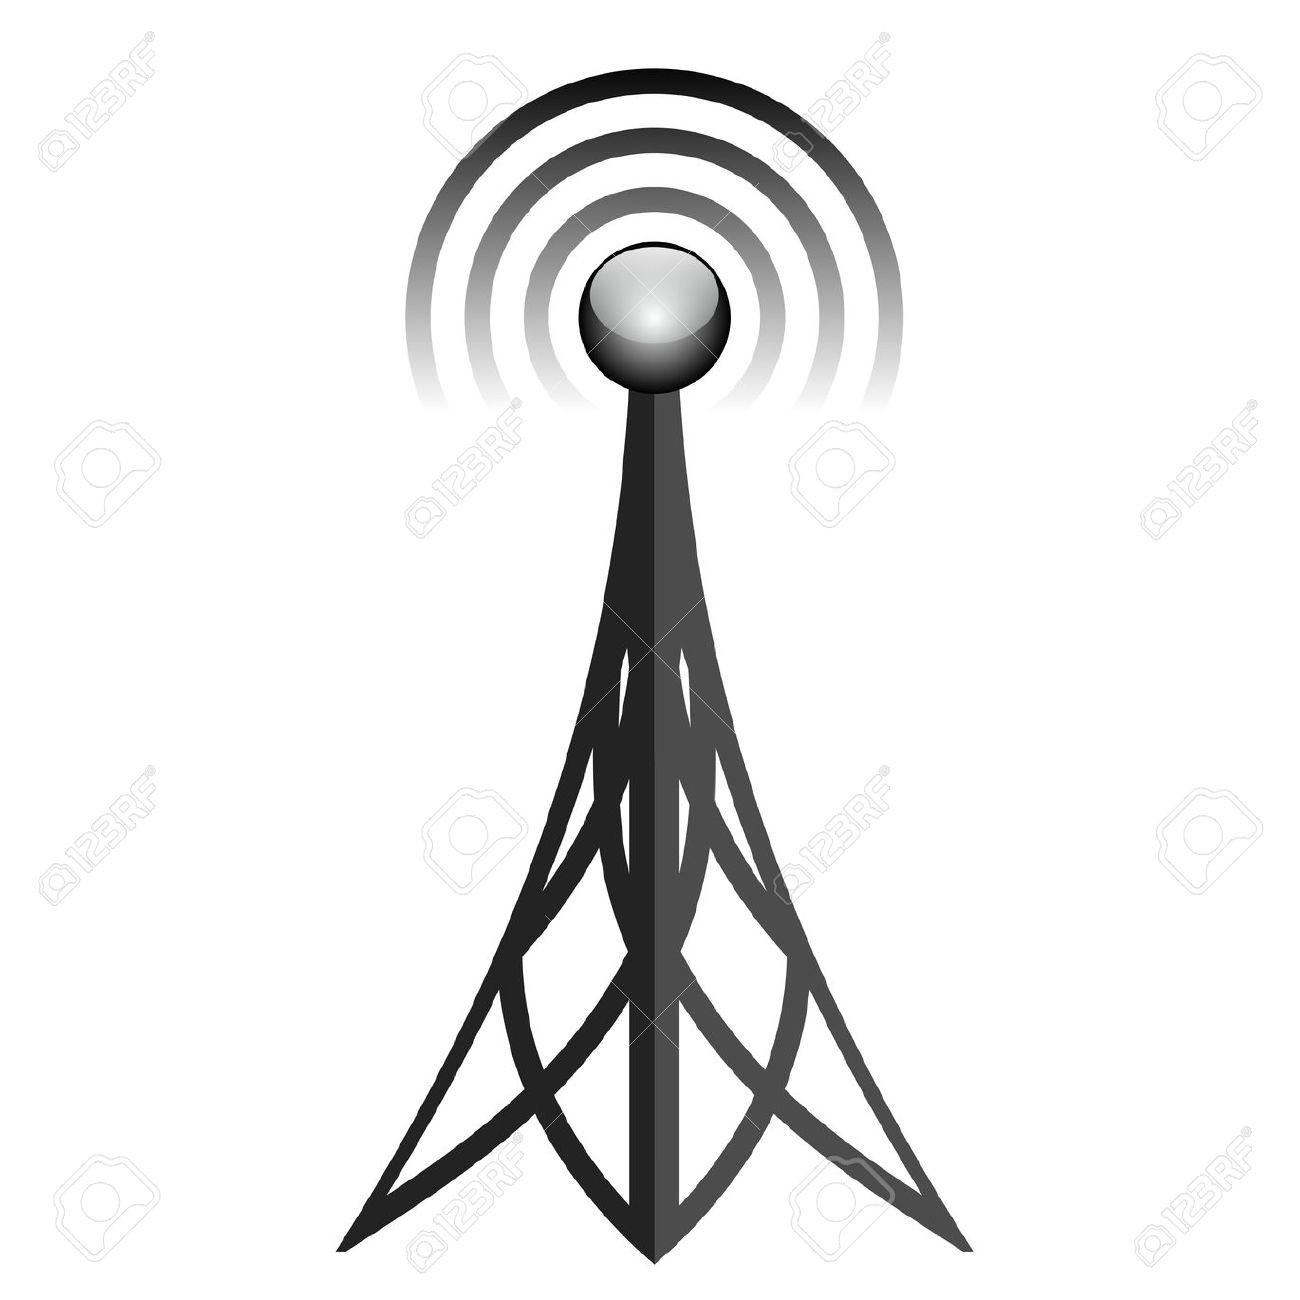 Radio tower clipart.